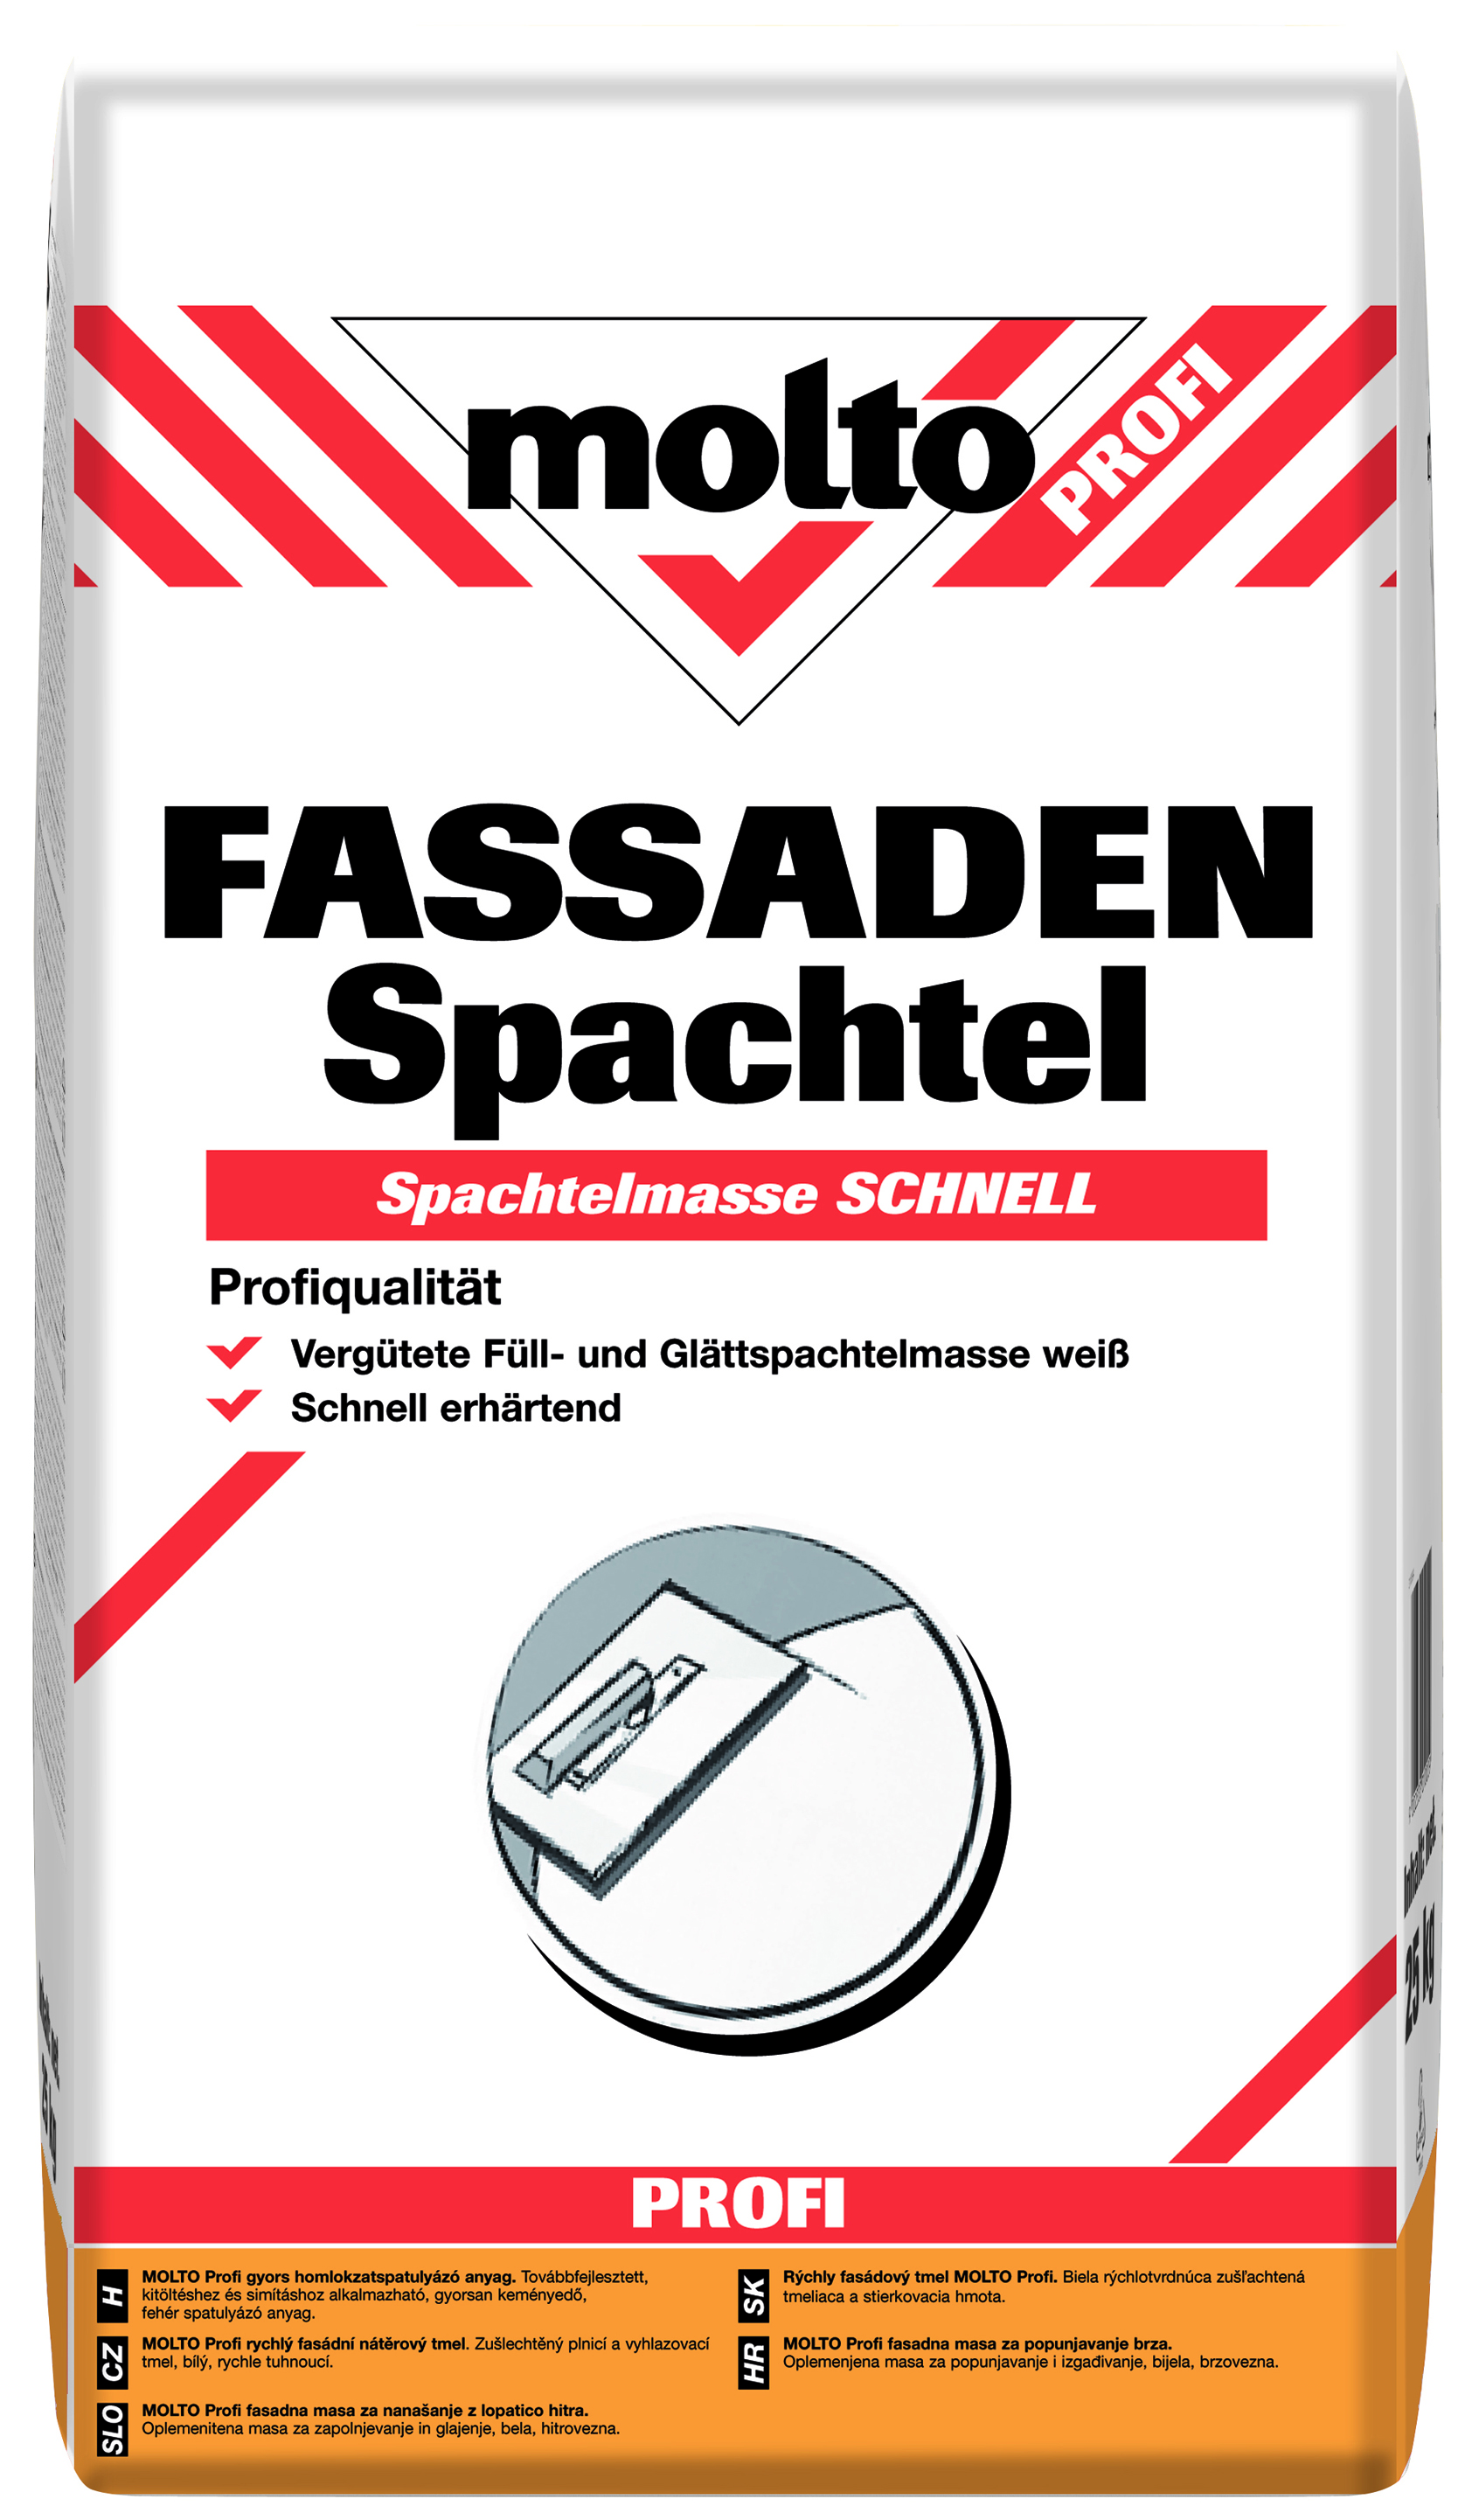 molto profi fassaden spachtel - molto at